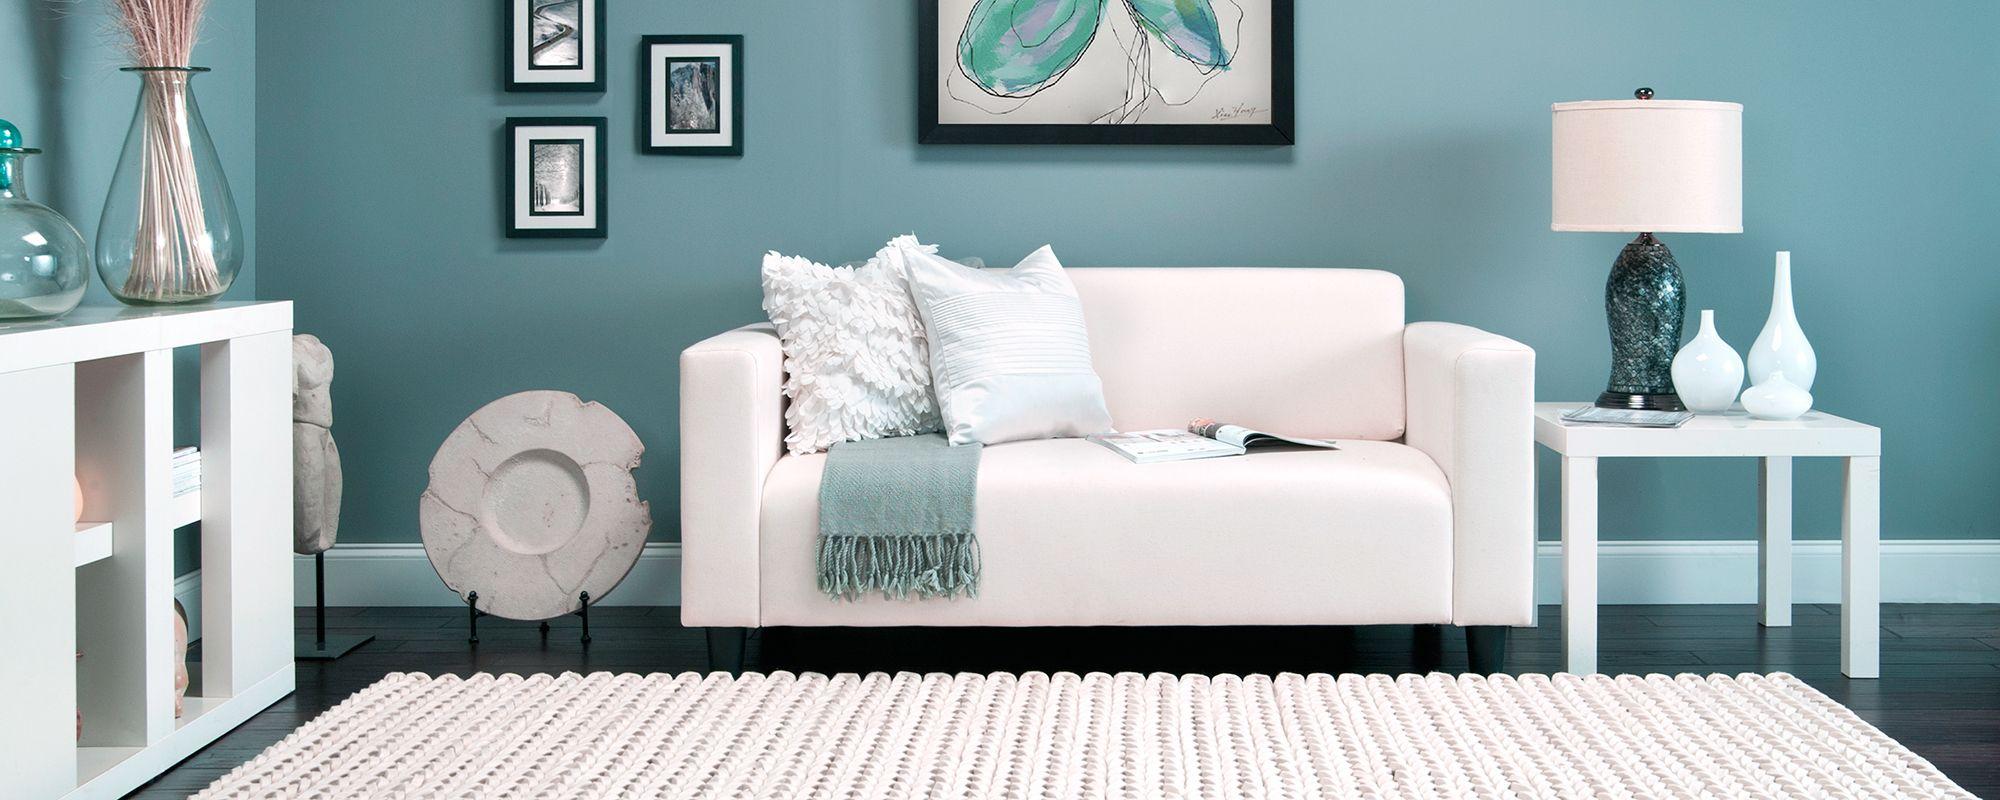 Largelivingroomdecorationwithblueseawallcolorinterior Simple Blue Color Living Room Designs Design Decoration